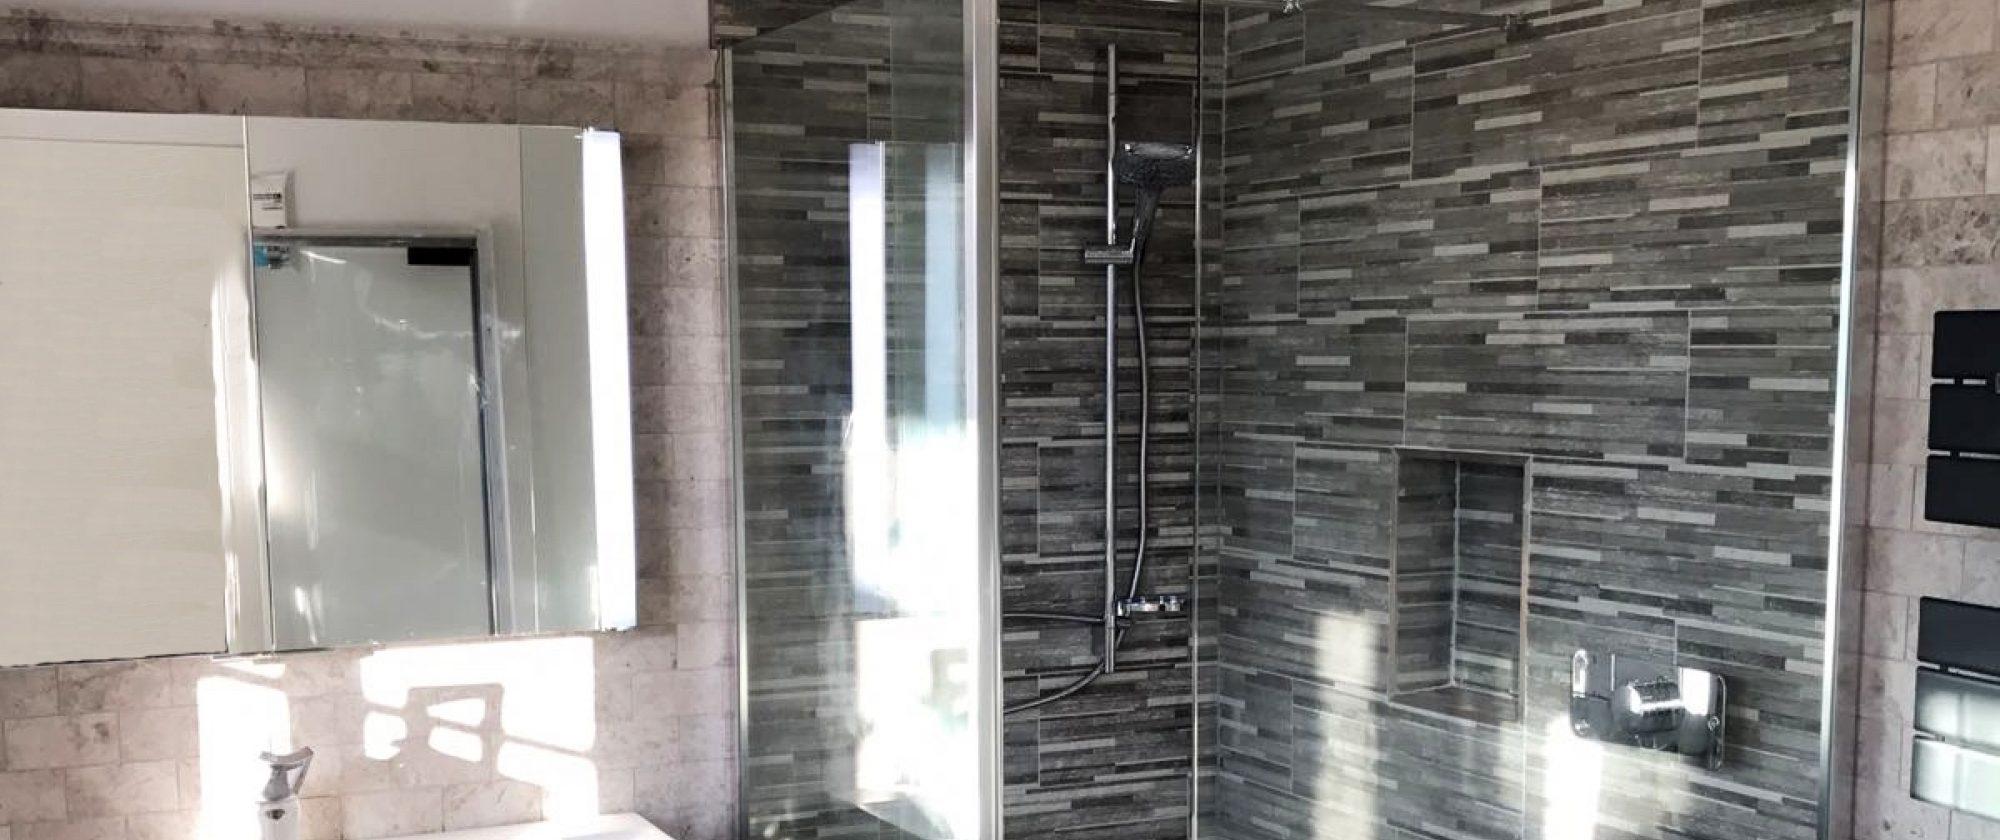 Shower Enclosure 2 Copy